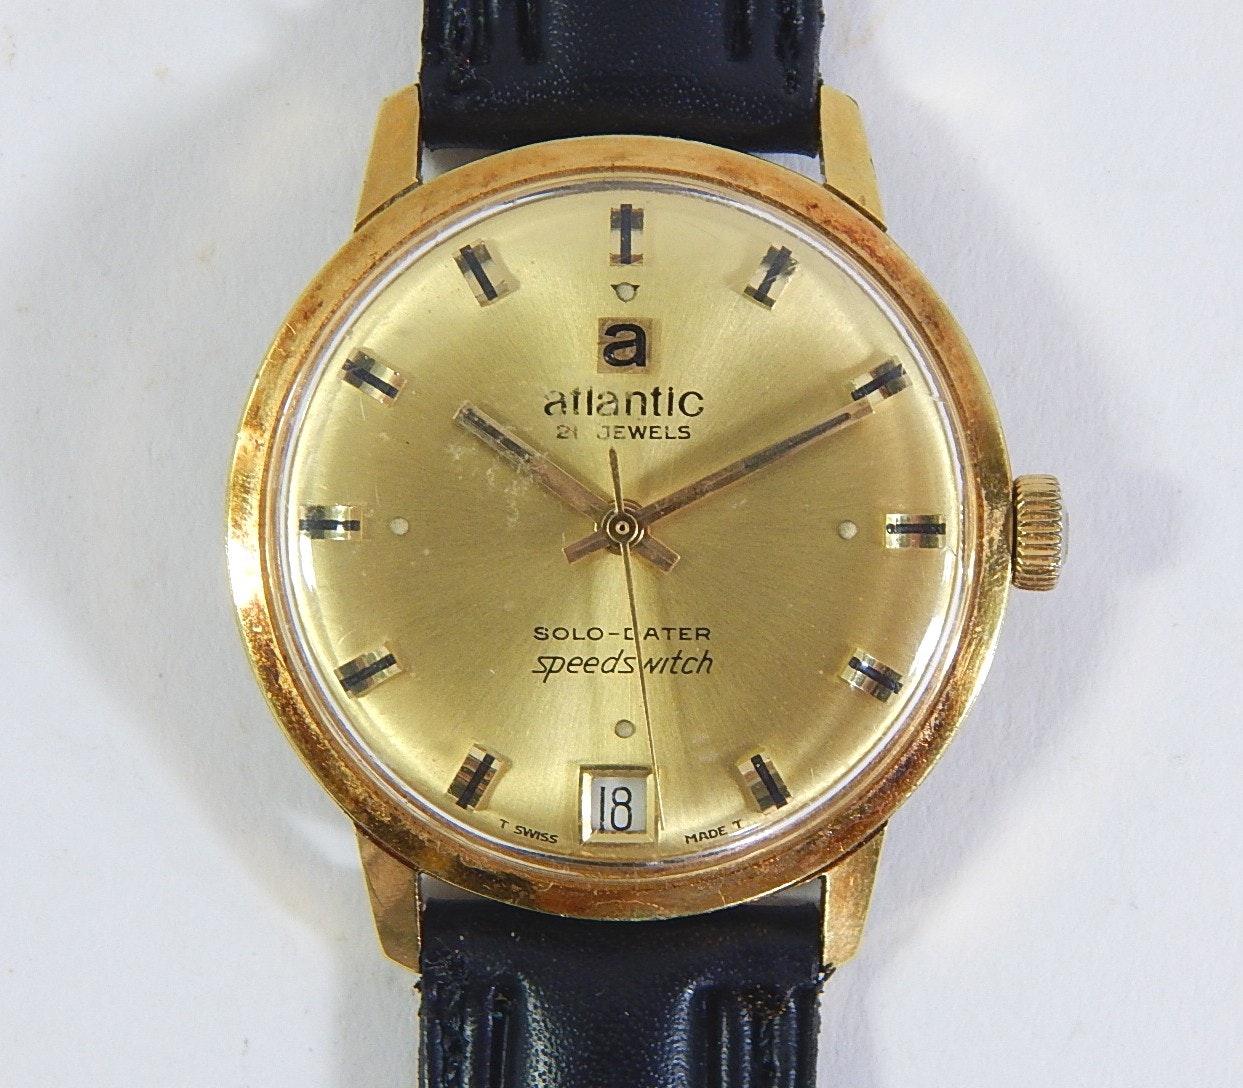 Vintage Atlantic 21 Jewel Solo-Dater Speedswitch Gold-Tone Wristwatch